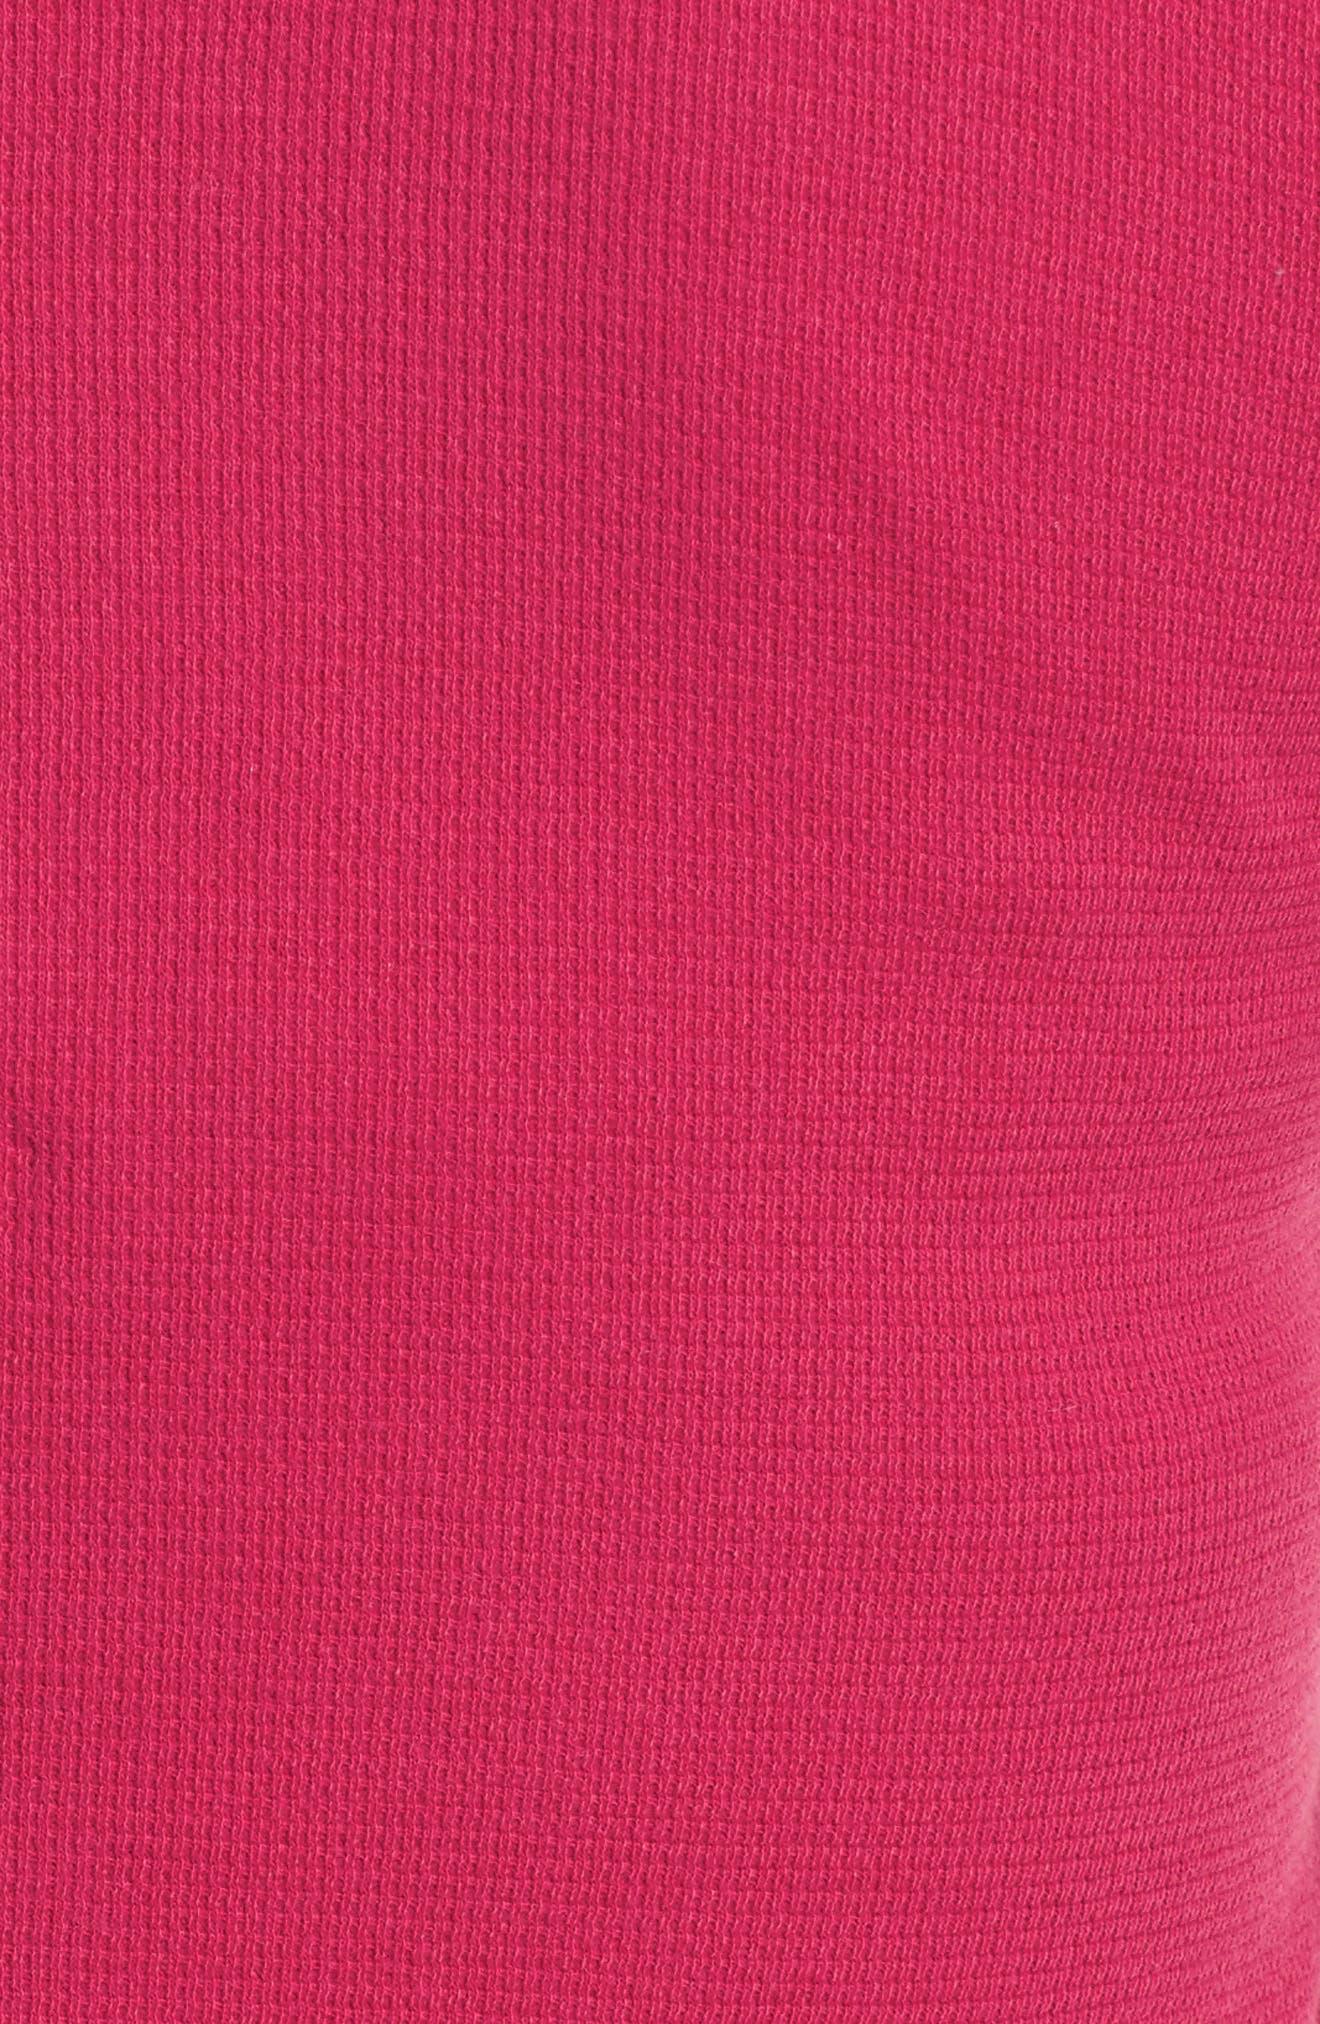 Lace-Up Bib Thermal Top,                             Alternate thumbnail 15, color,